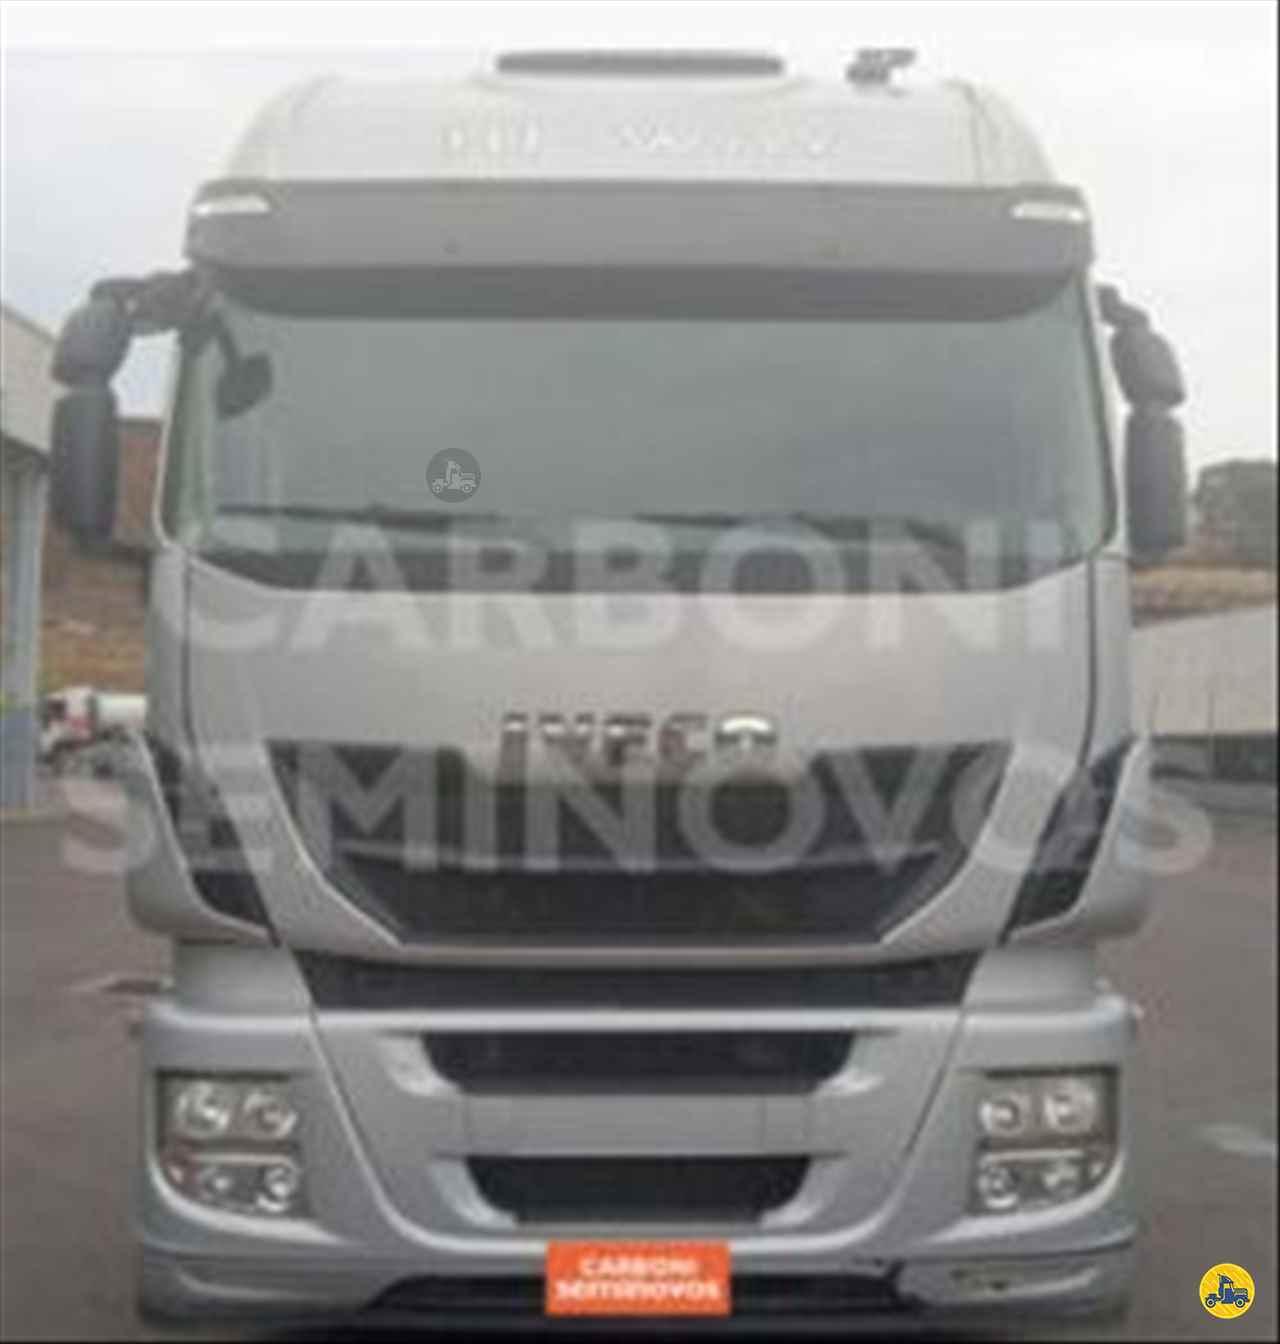 CAMINHAO IVECO STRALIS 560 Cavalo Mecânico Truck 6x2 Carboni Iveco VIDEIRA SANTA CATARINA SC